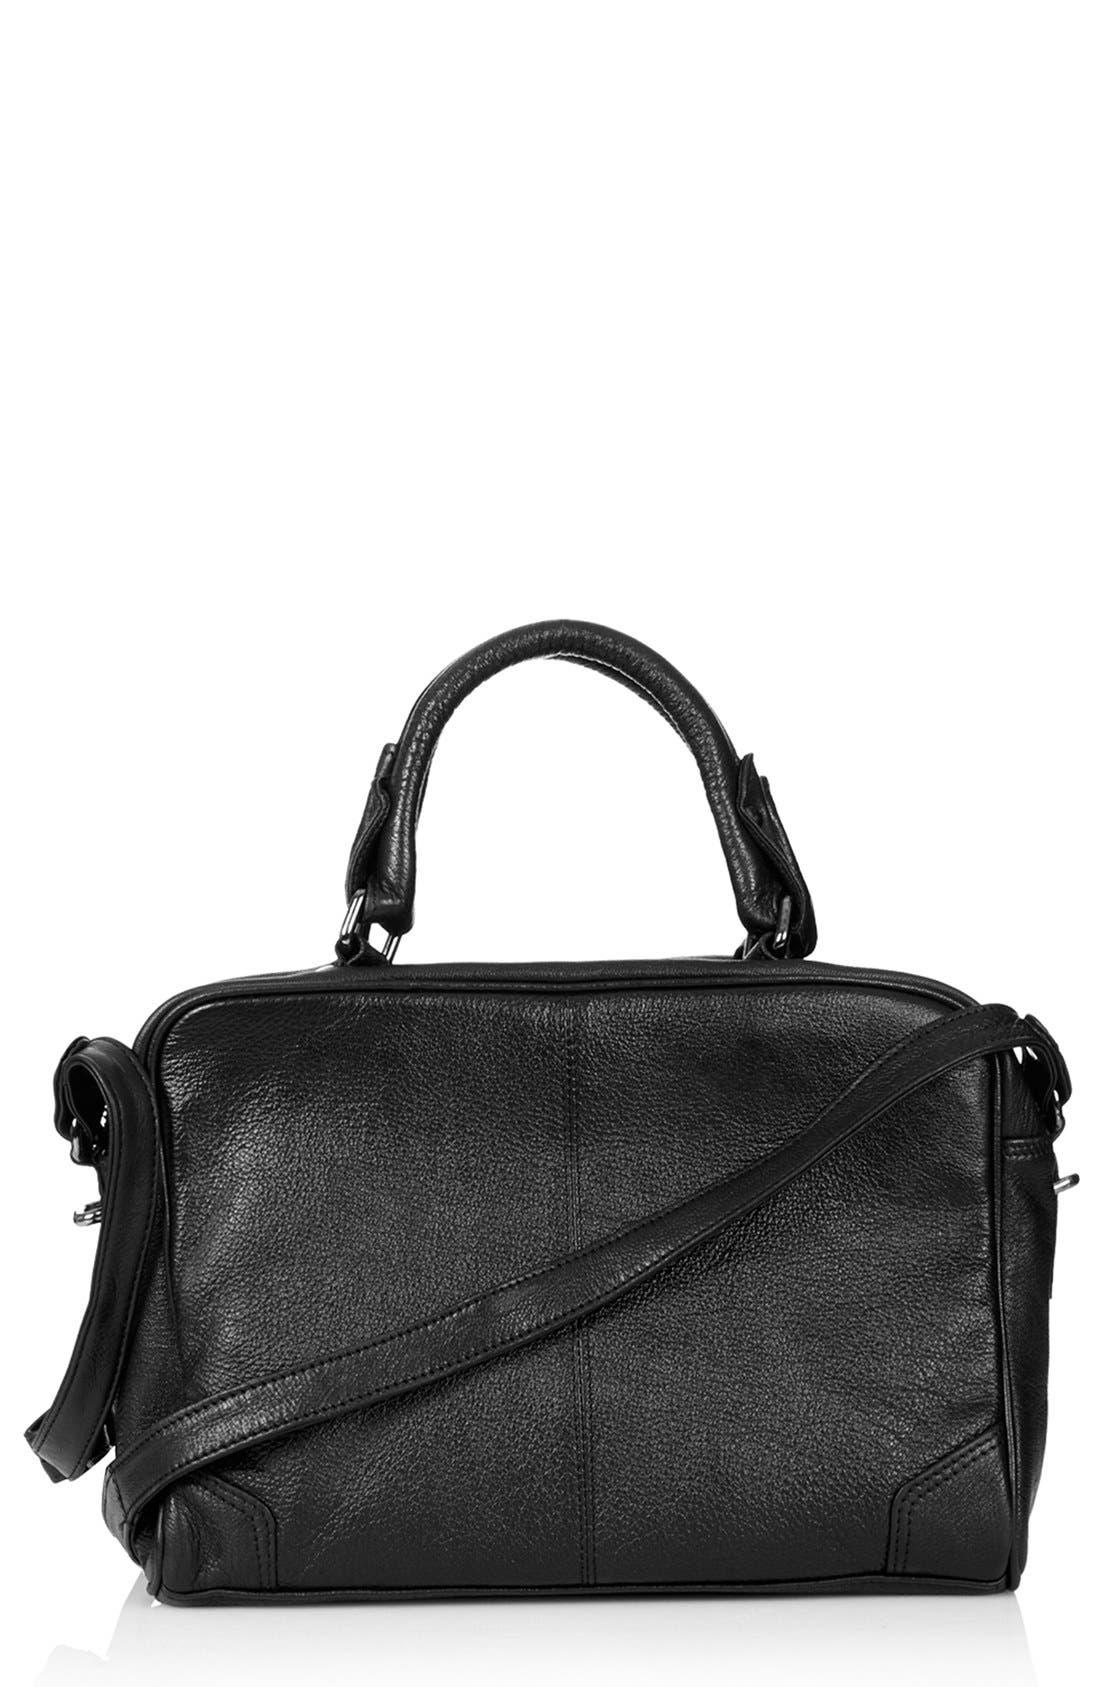 Main Image - Topshop 'Medium' Leather Satchel